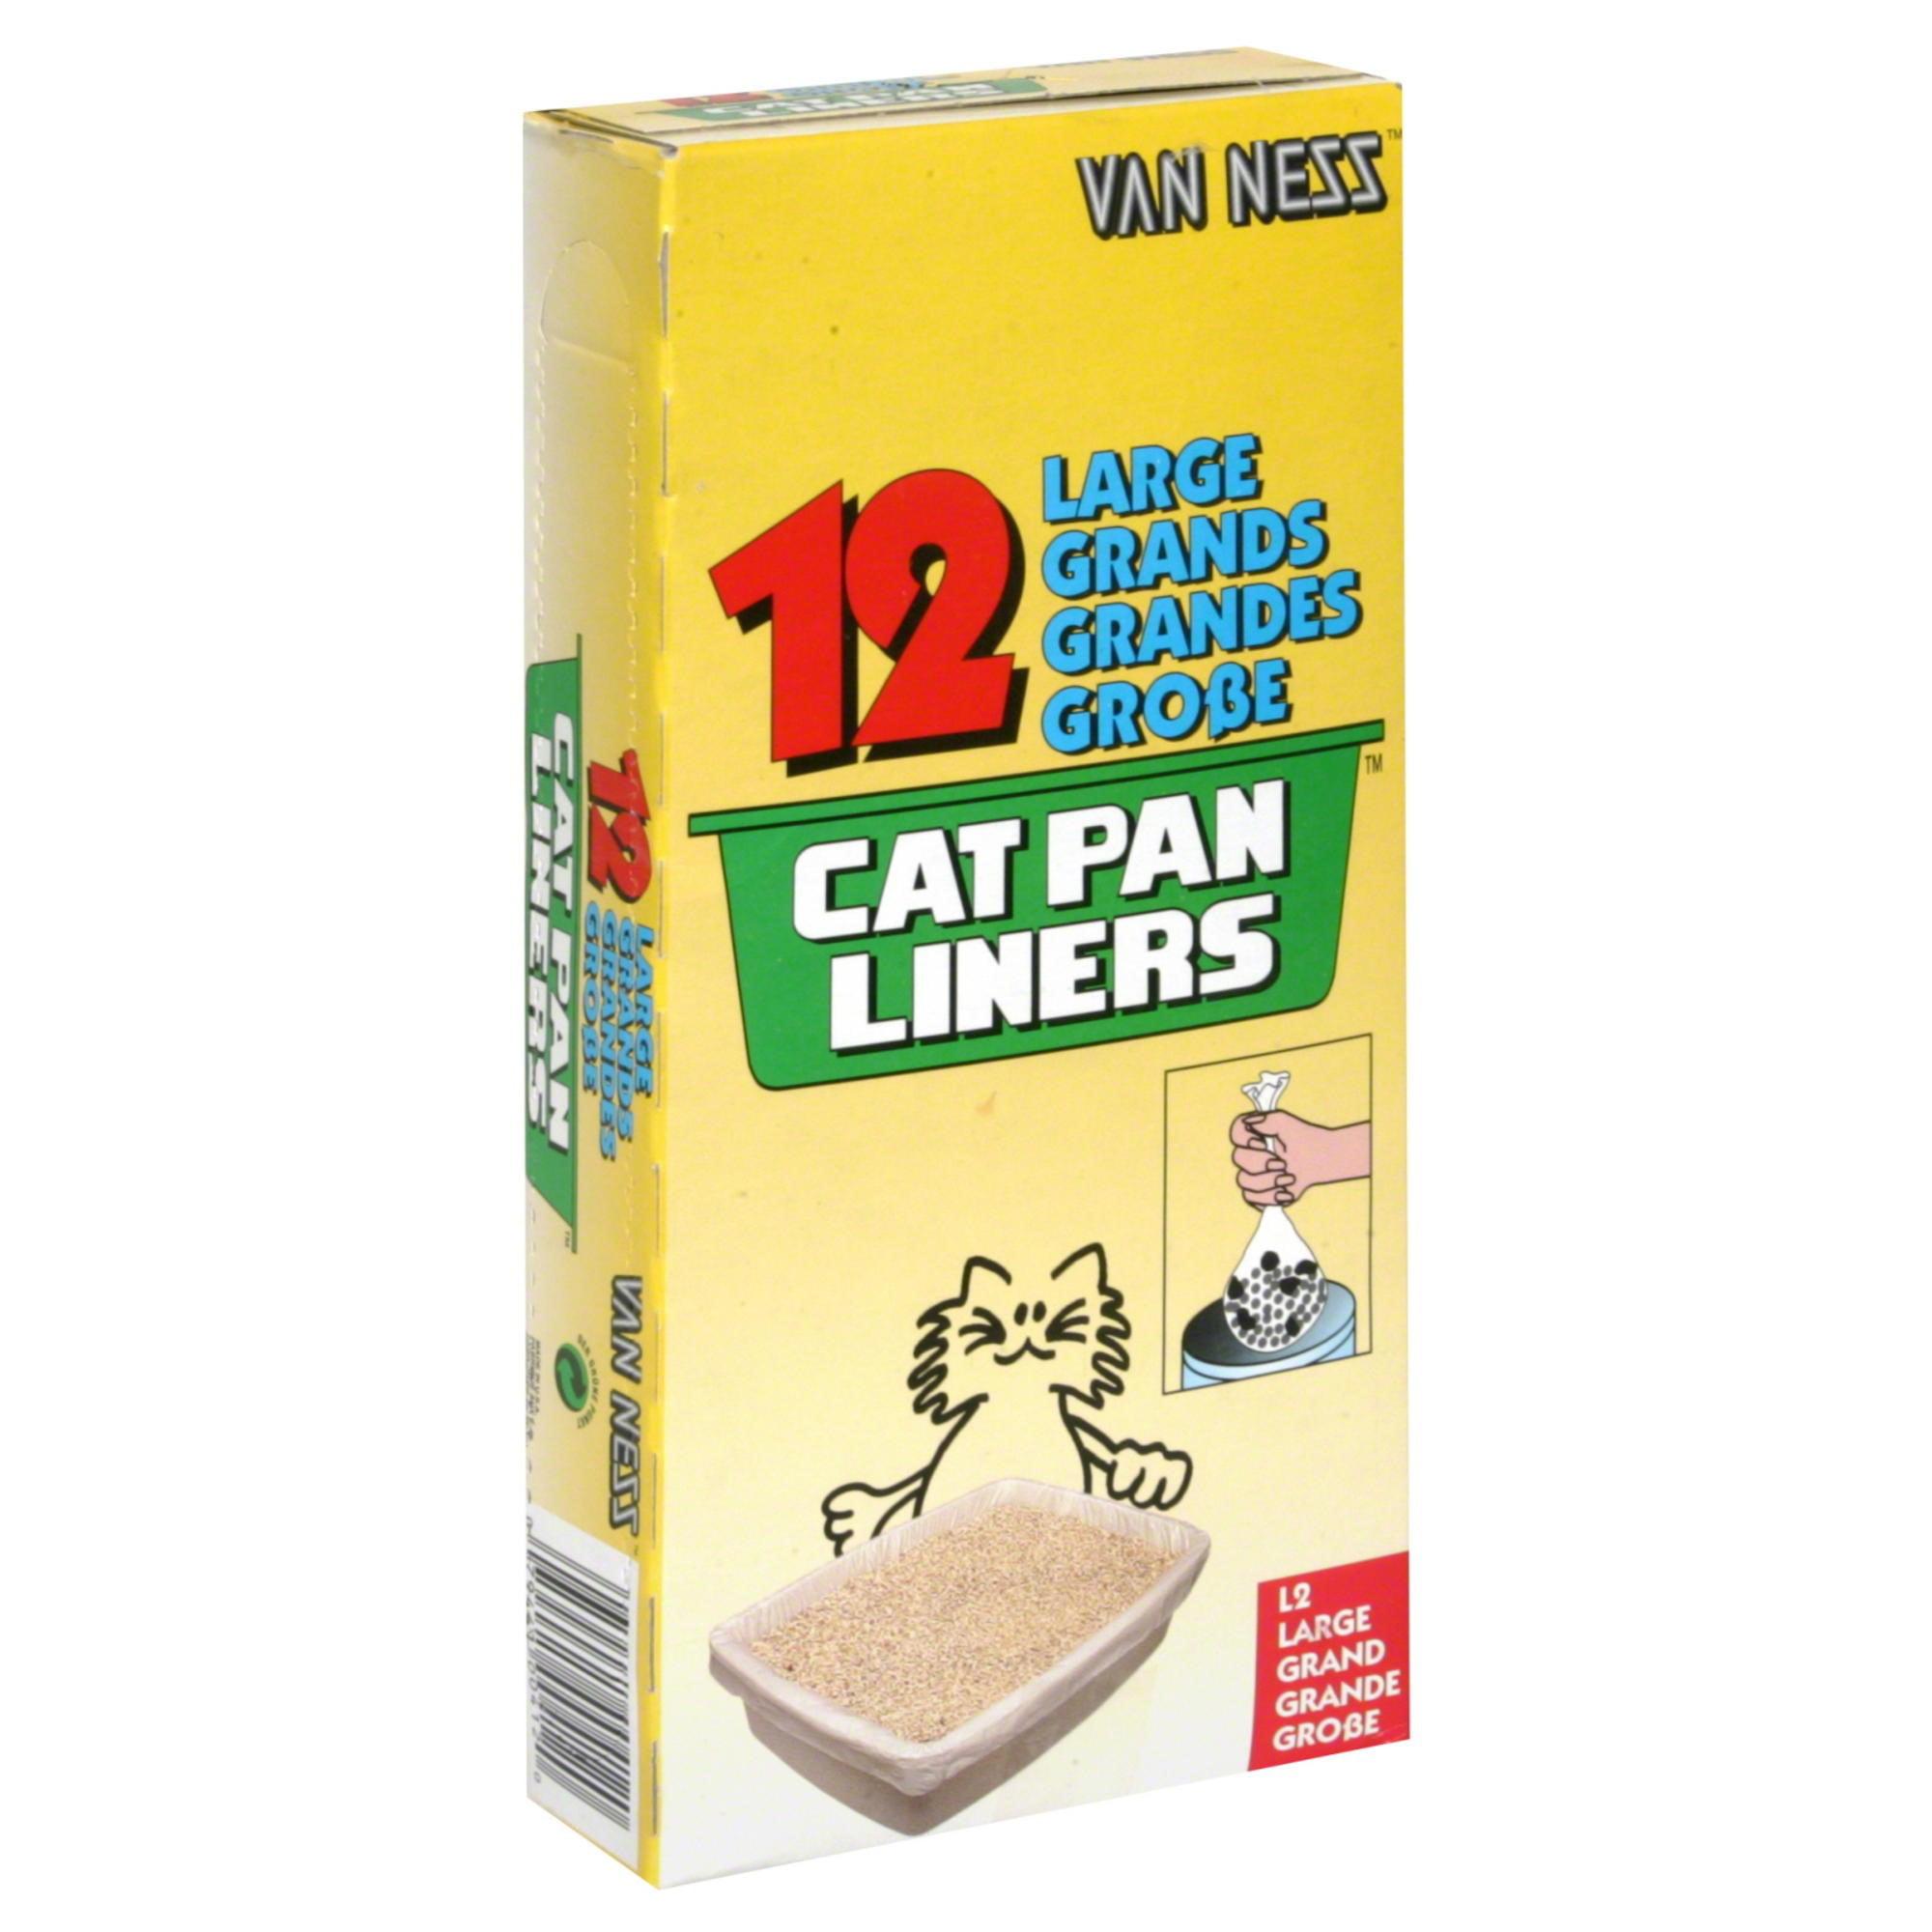 Van Ness, Cat Litter Box Liners, Large, 12 count